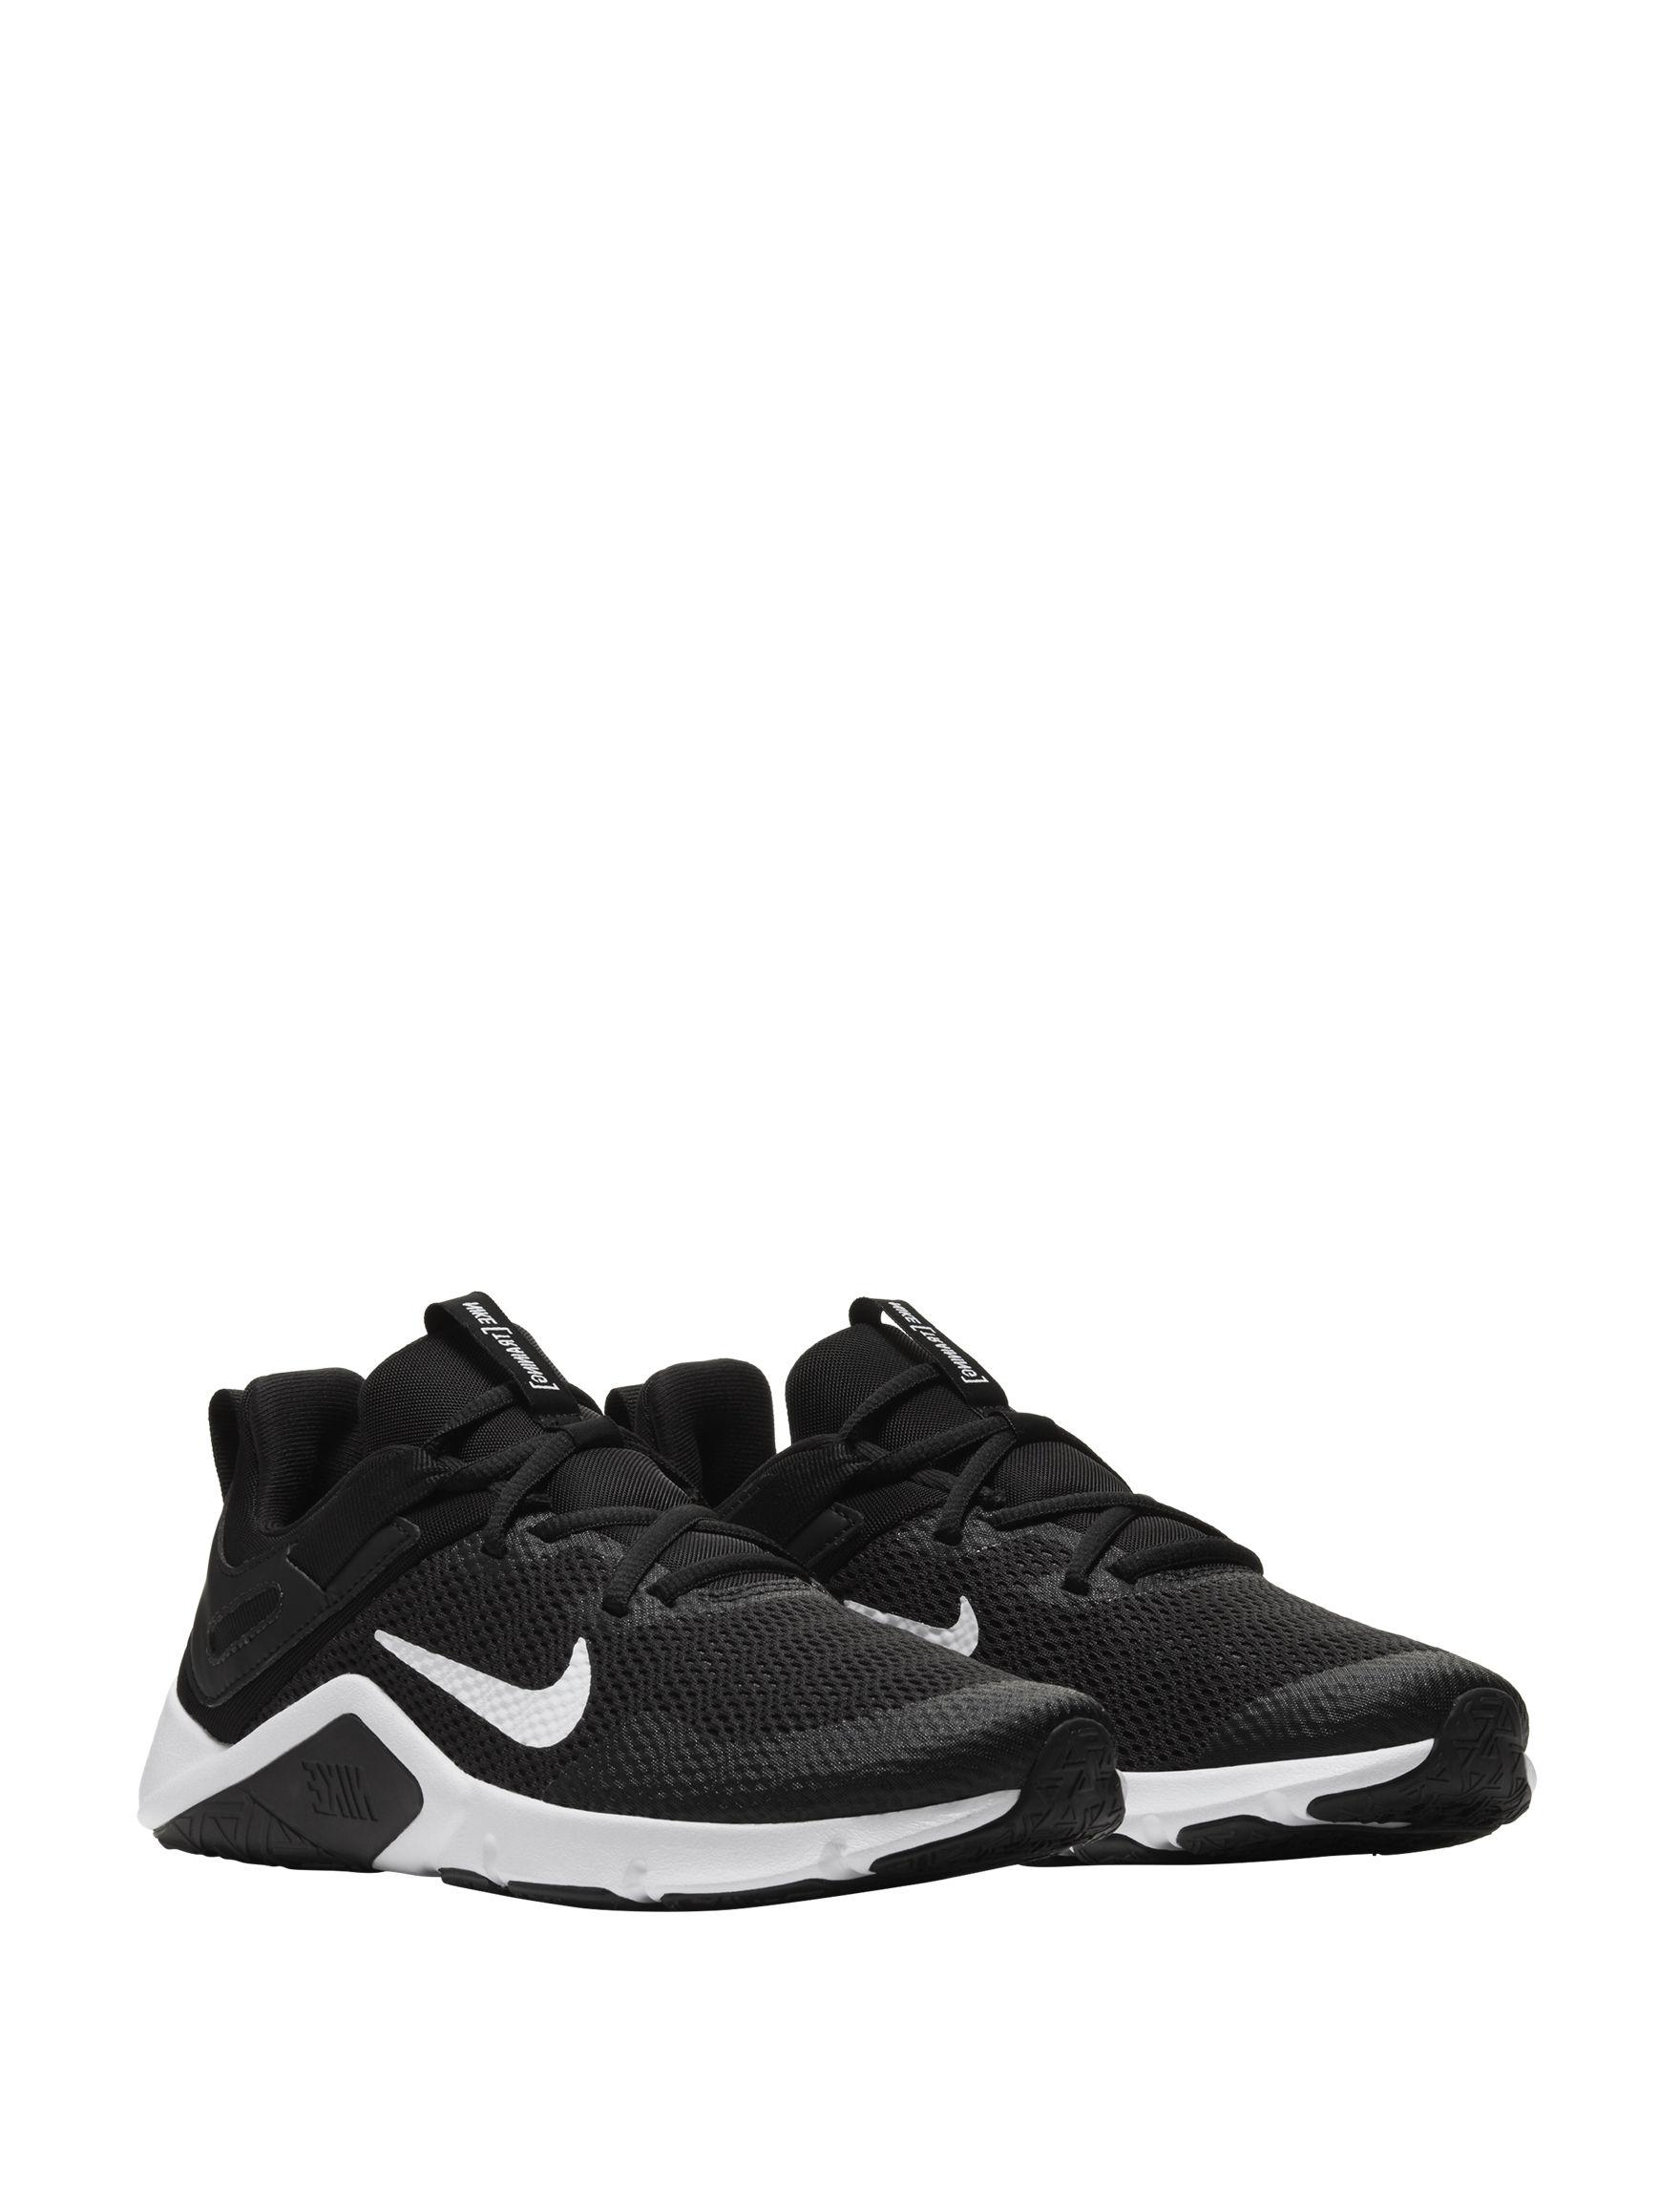 Nike Black Comfort Shoes